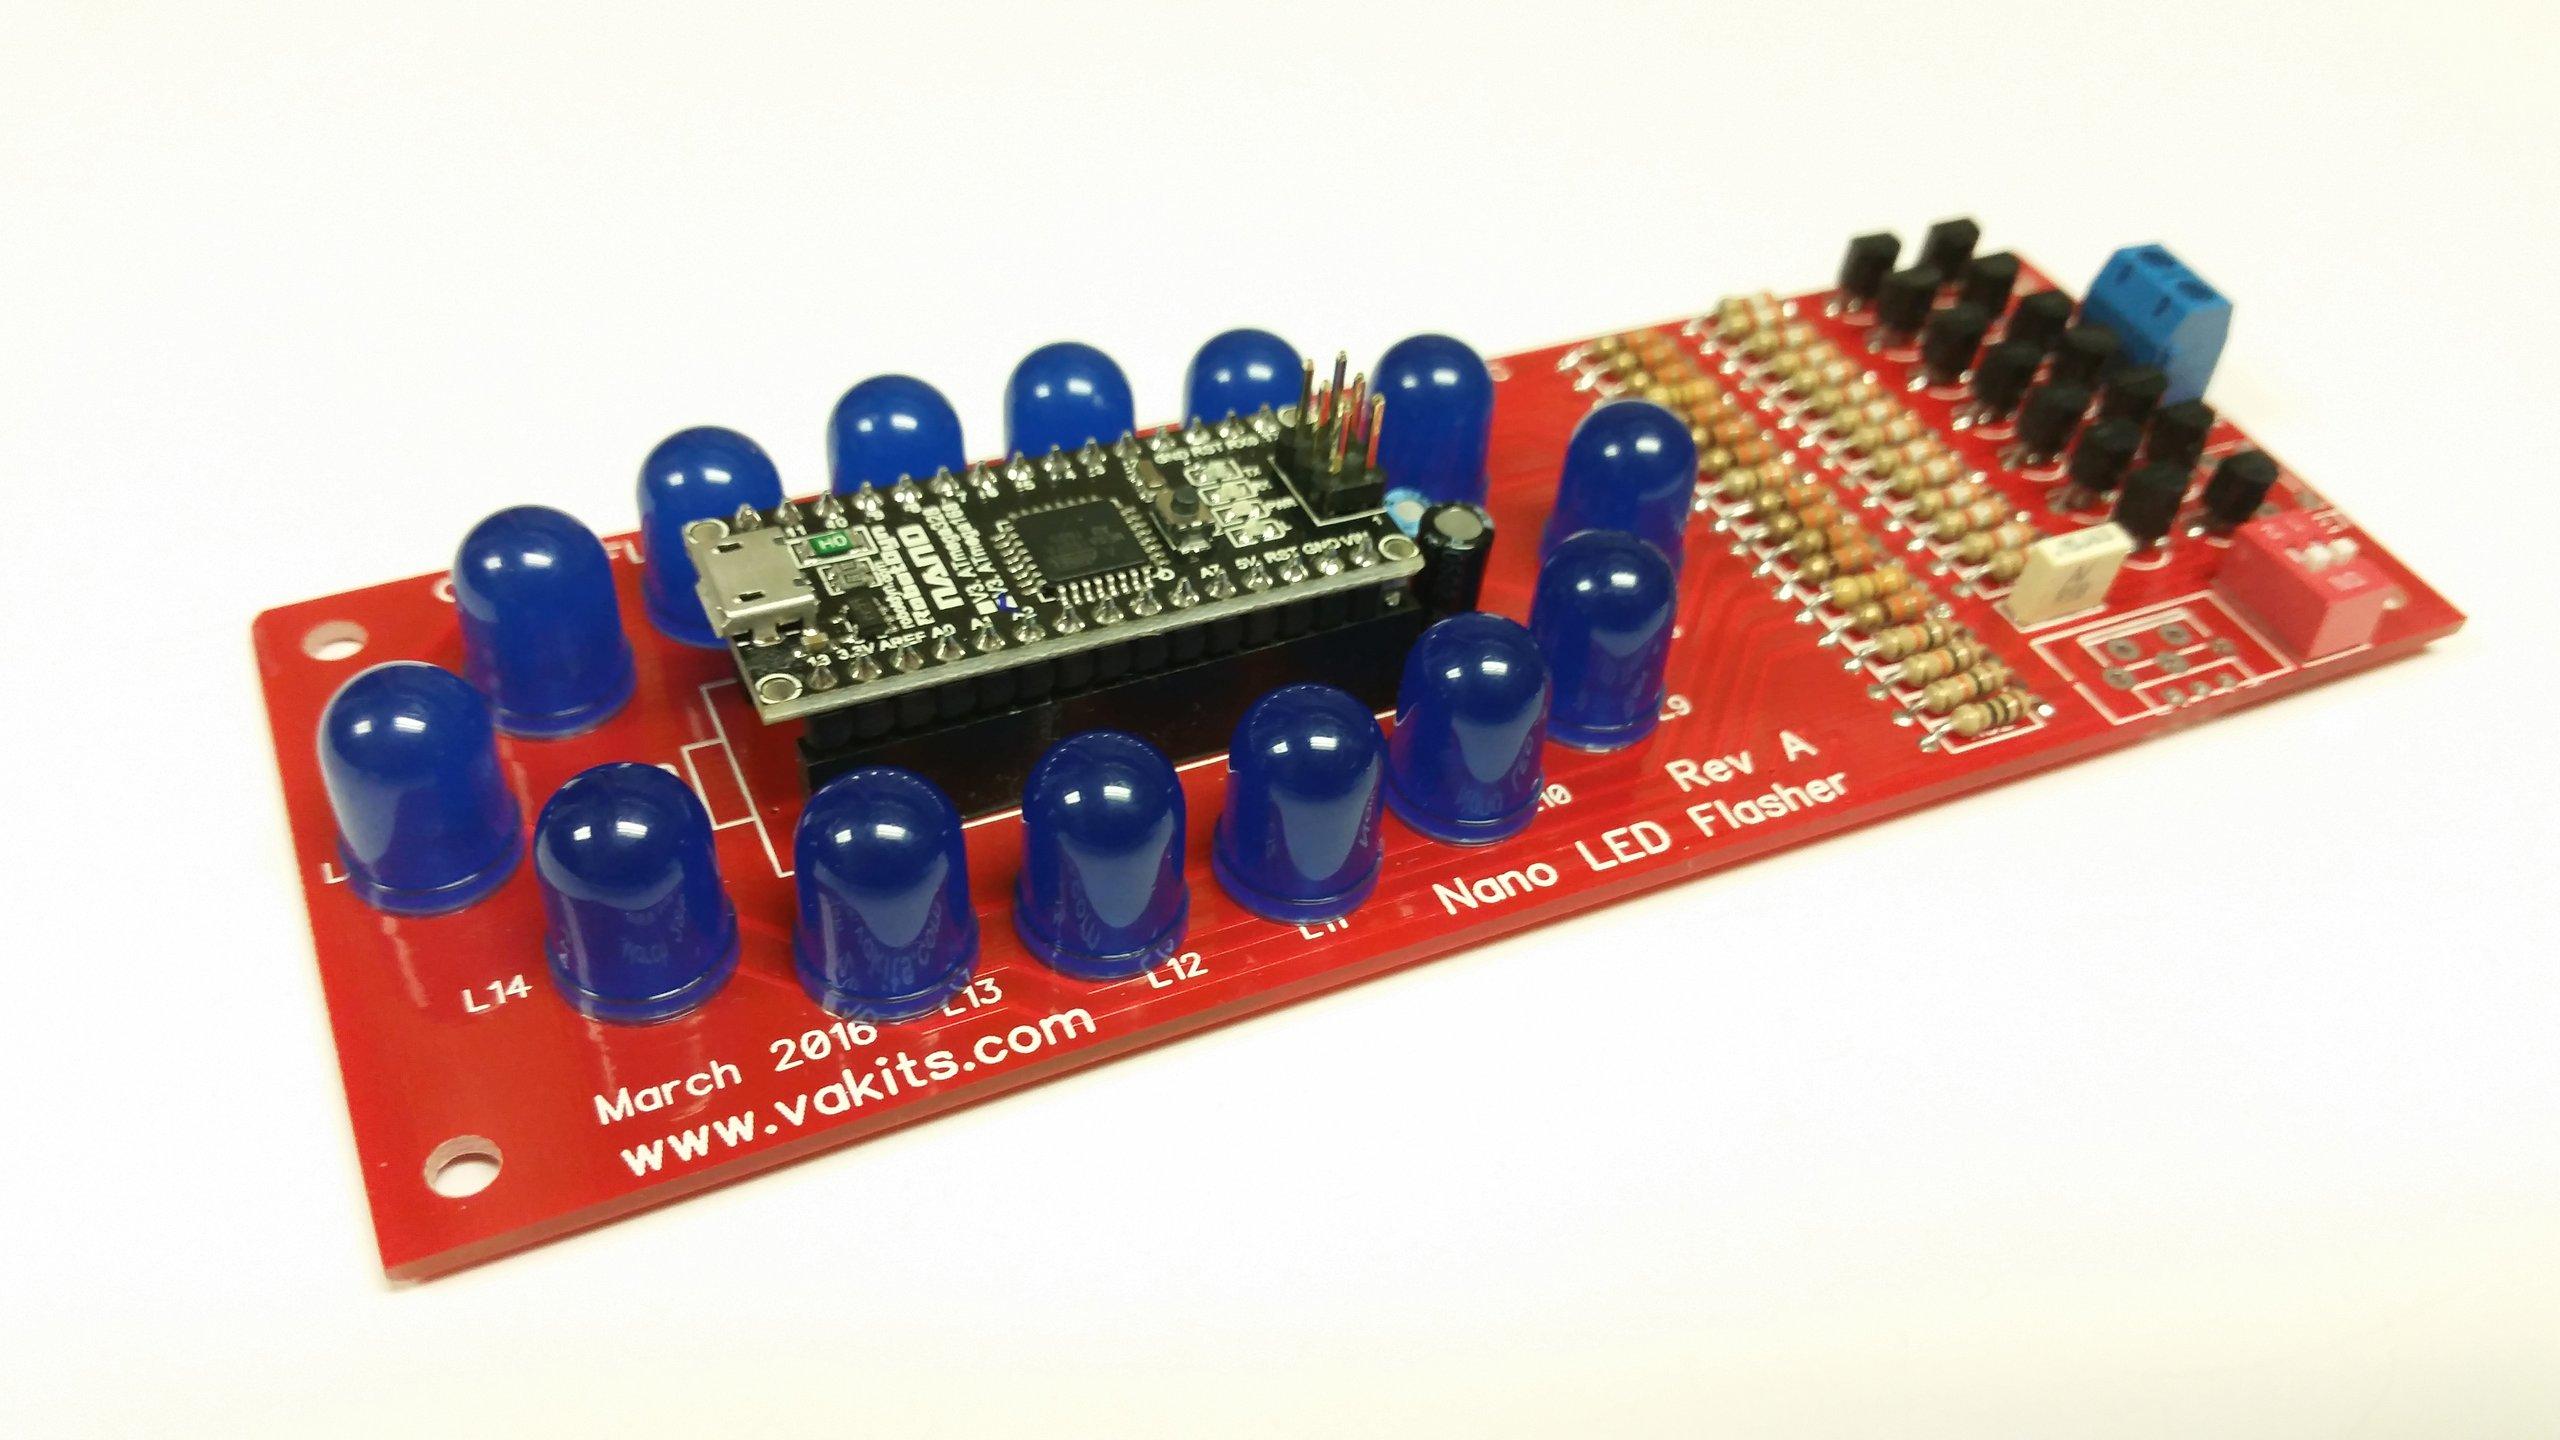 Arduino nano led flasher kit from nfceramics on tindie